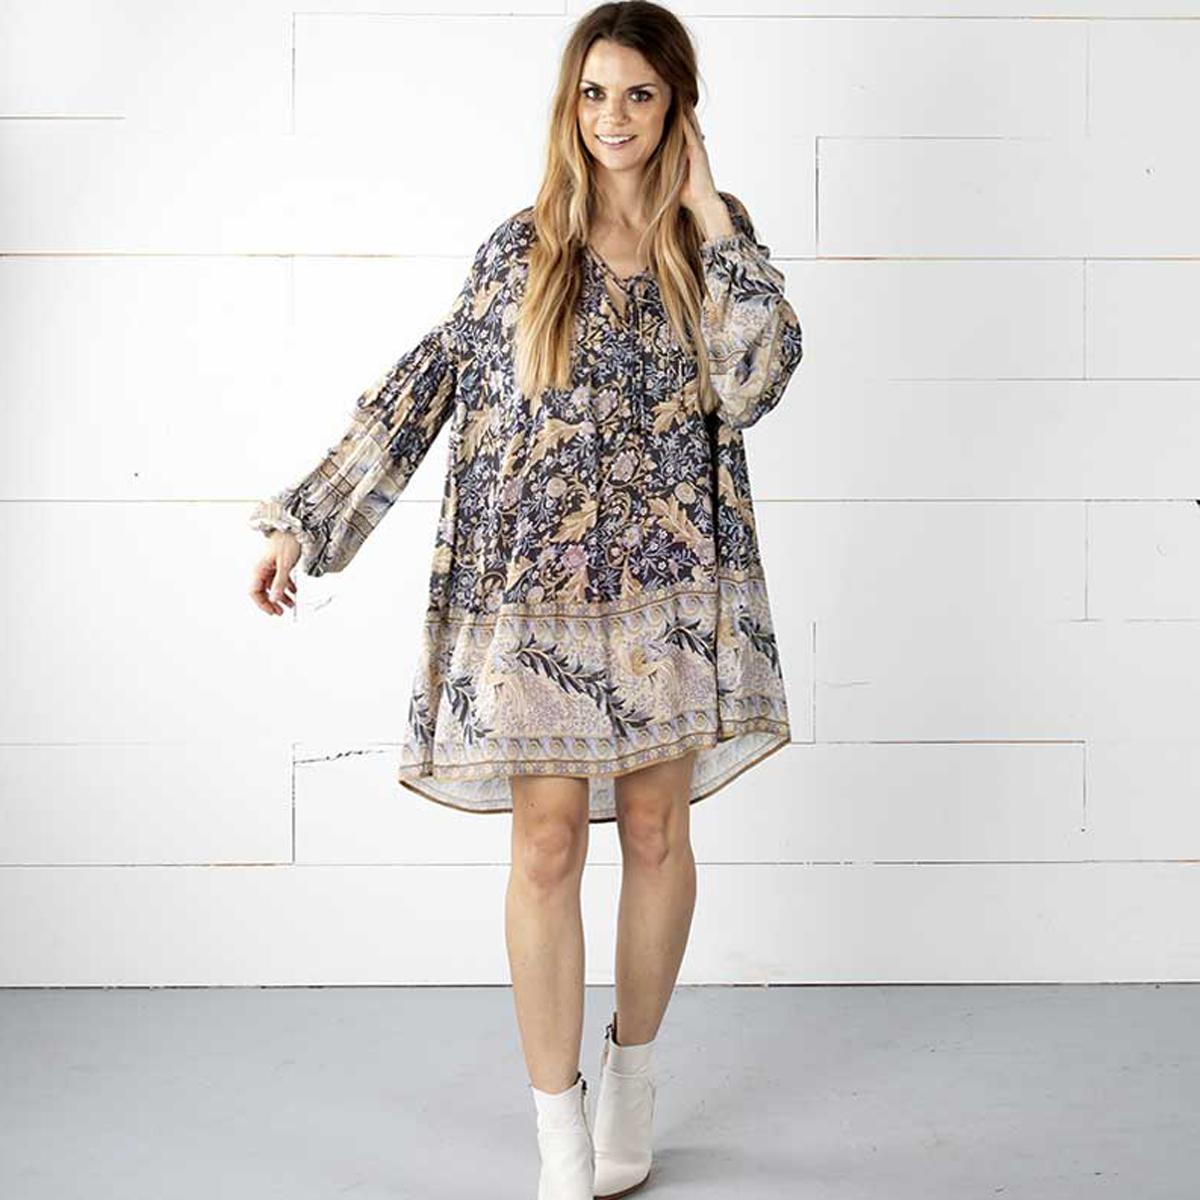 f4838844cfae wholesale Boho Oasis Long Sleeve Mini Dress V-Neck with Tie Hippie Chic  Women Dresses